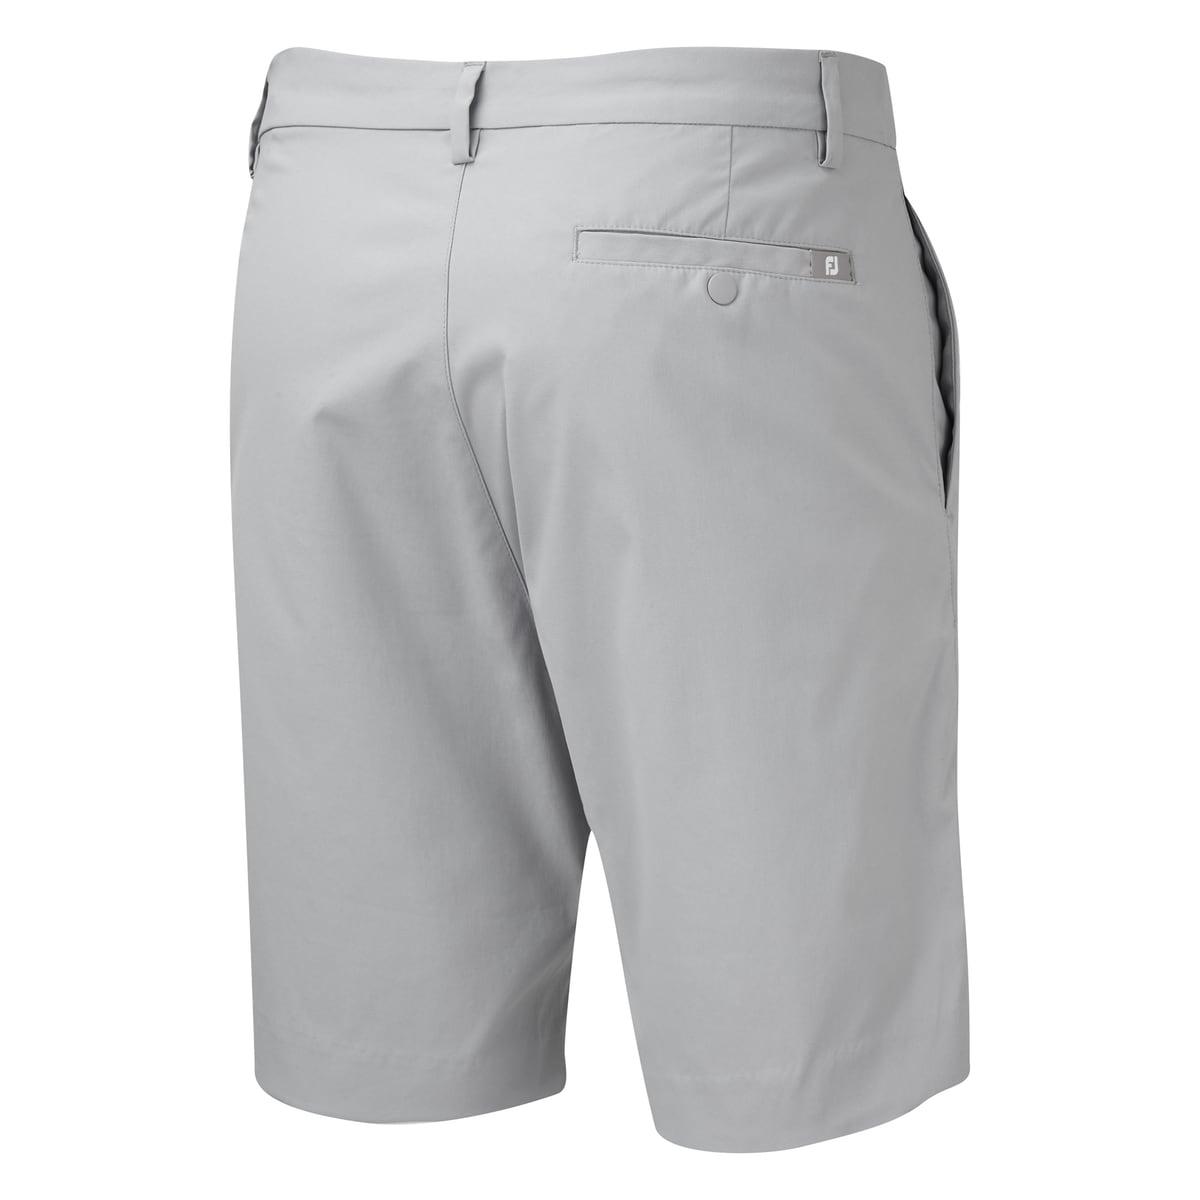 FJ Lite Tapered Fit Short